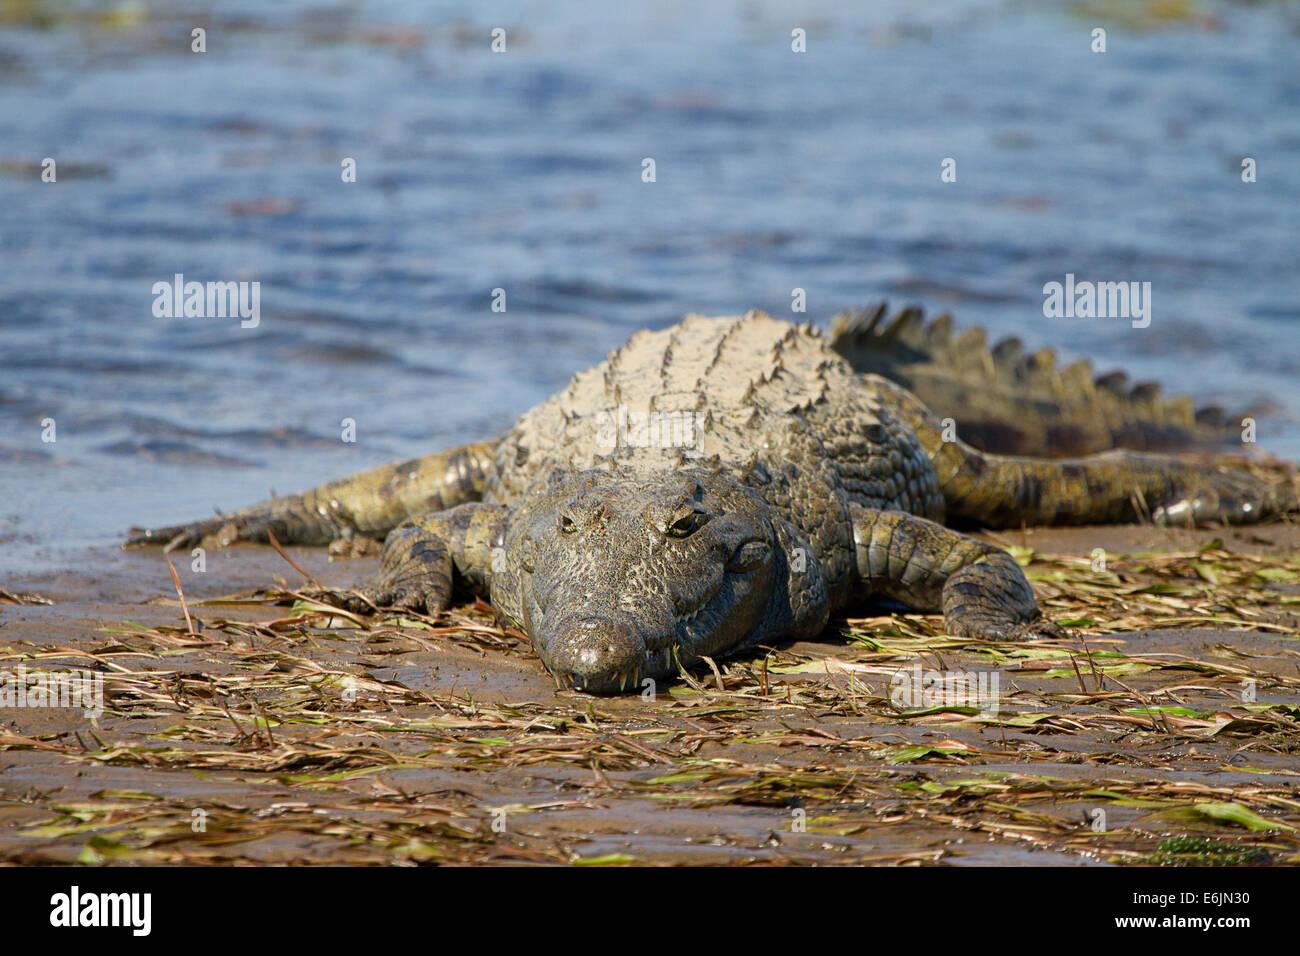 Crocodile basking in the sun, Zambezi River - Stock Image